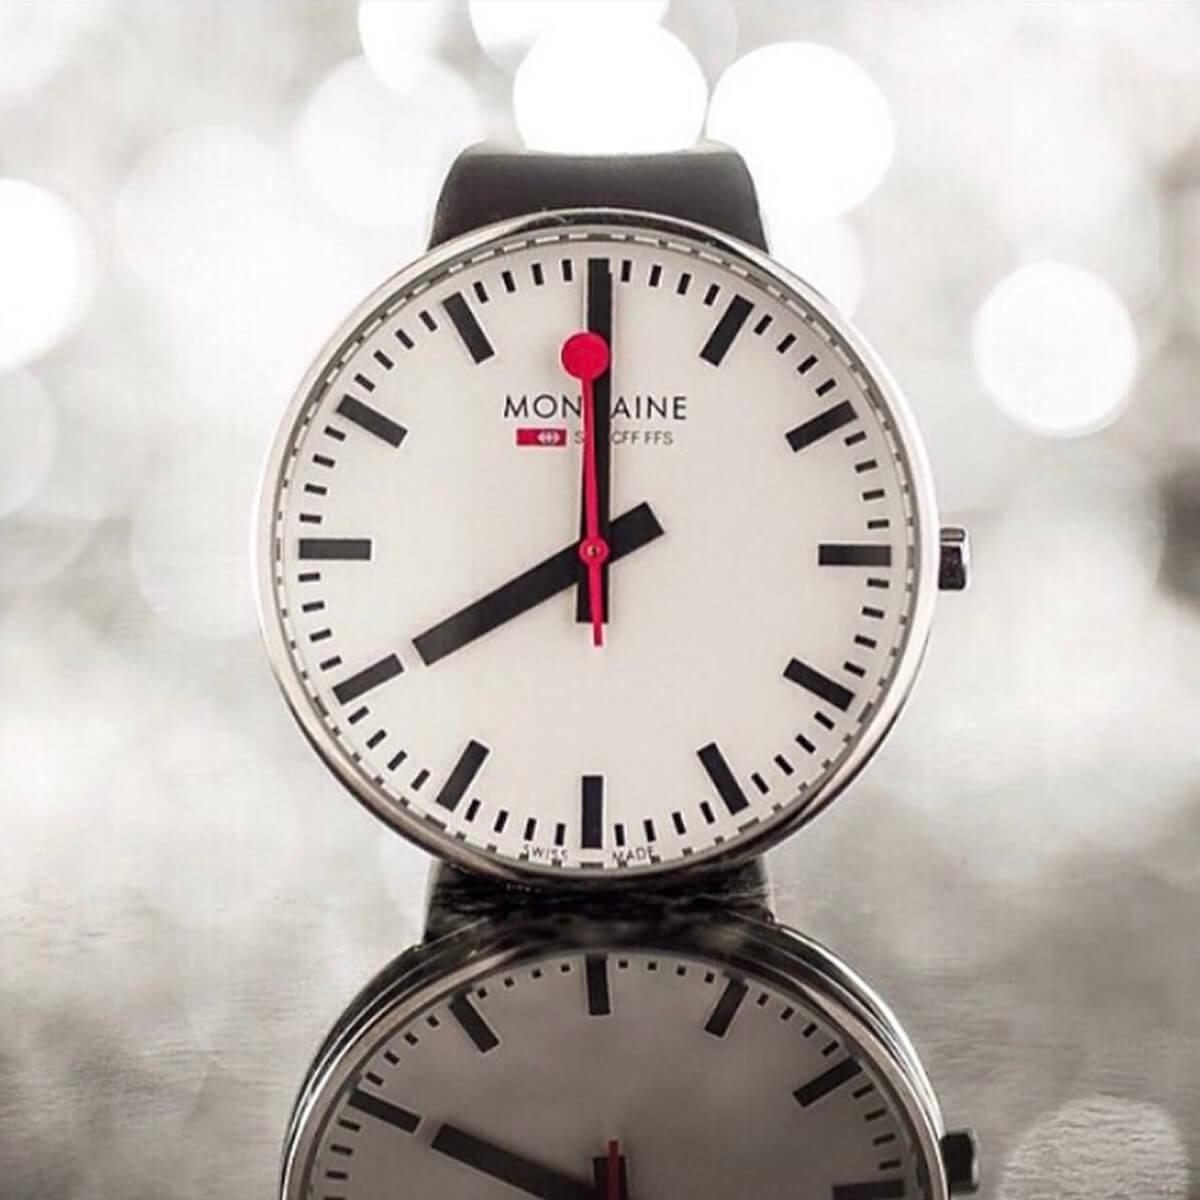 MONDAINE(モンディーン) 腕時計 ブランドイメージ インスタ クリスマスプレゼント 彼氏 鉄道時計 社会人 大学生